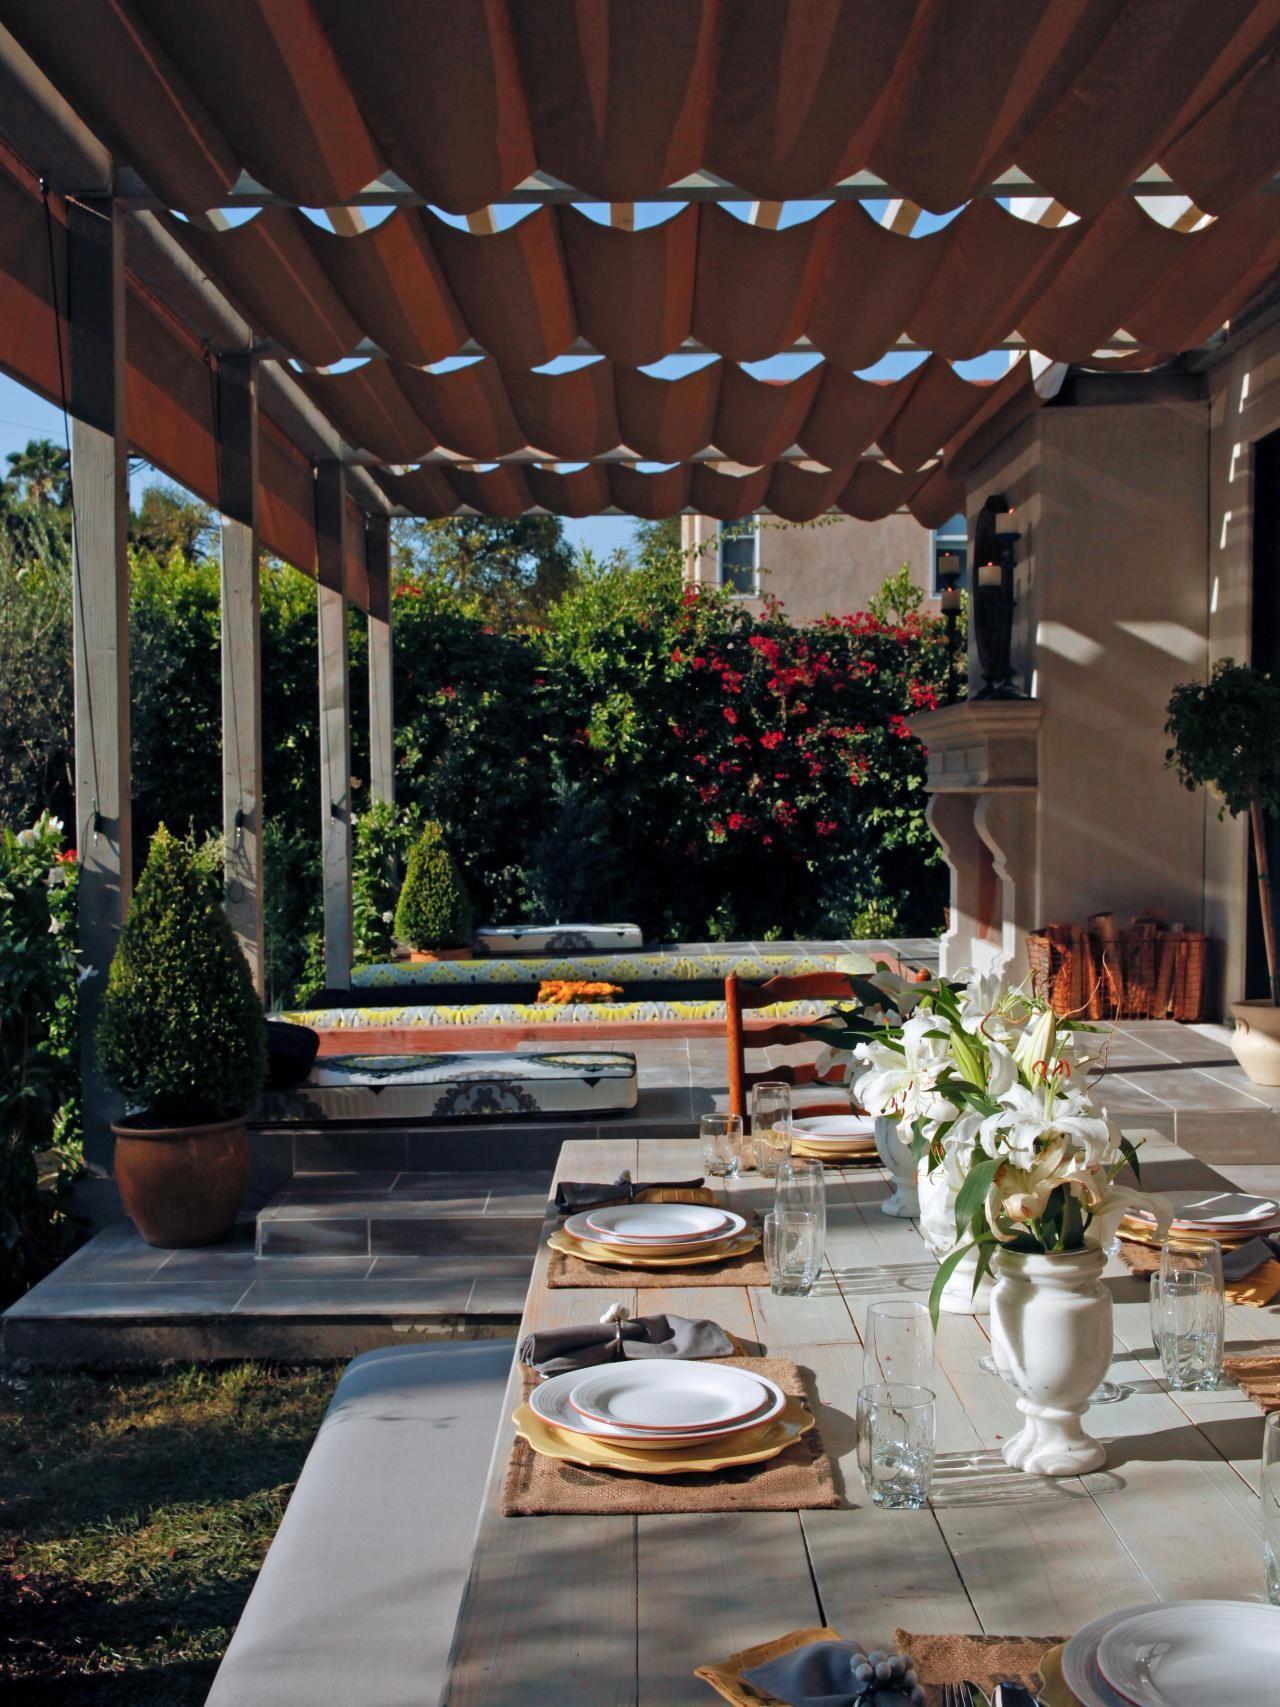 Make Shade Canopies Pergolas Gazebos and More